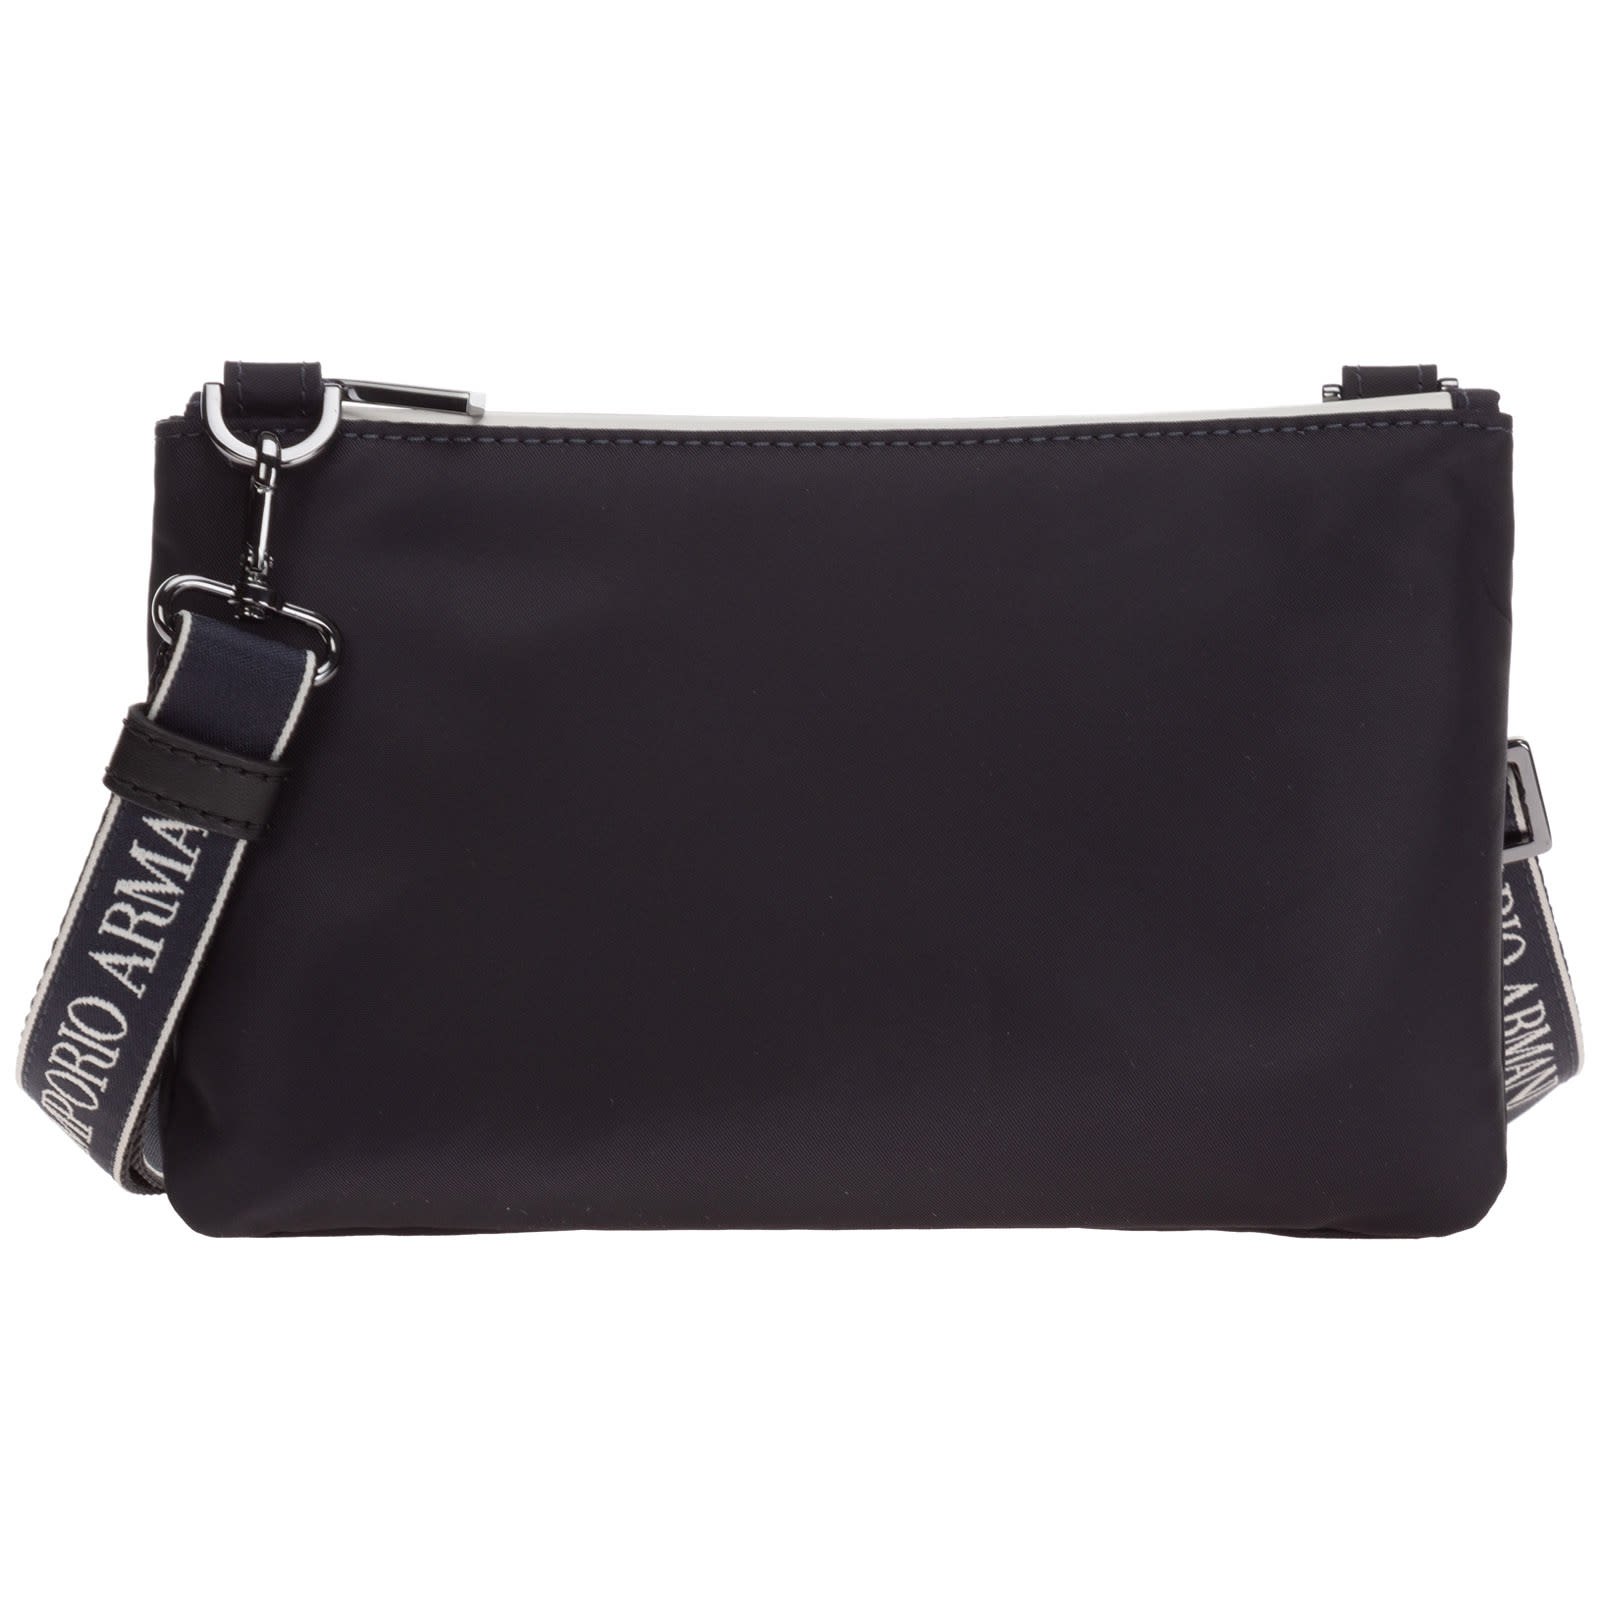 Emporio Armani Cross Crossbody Bags